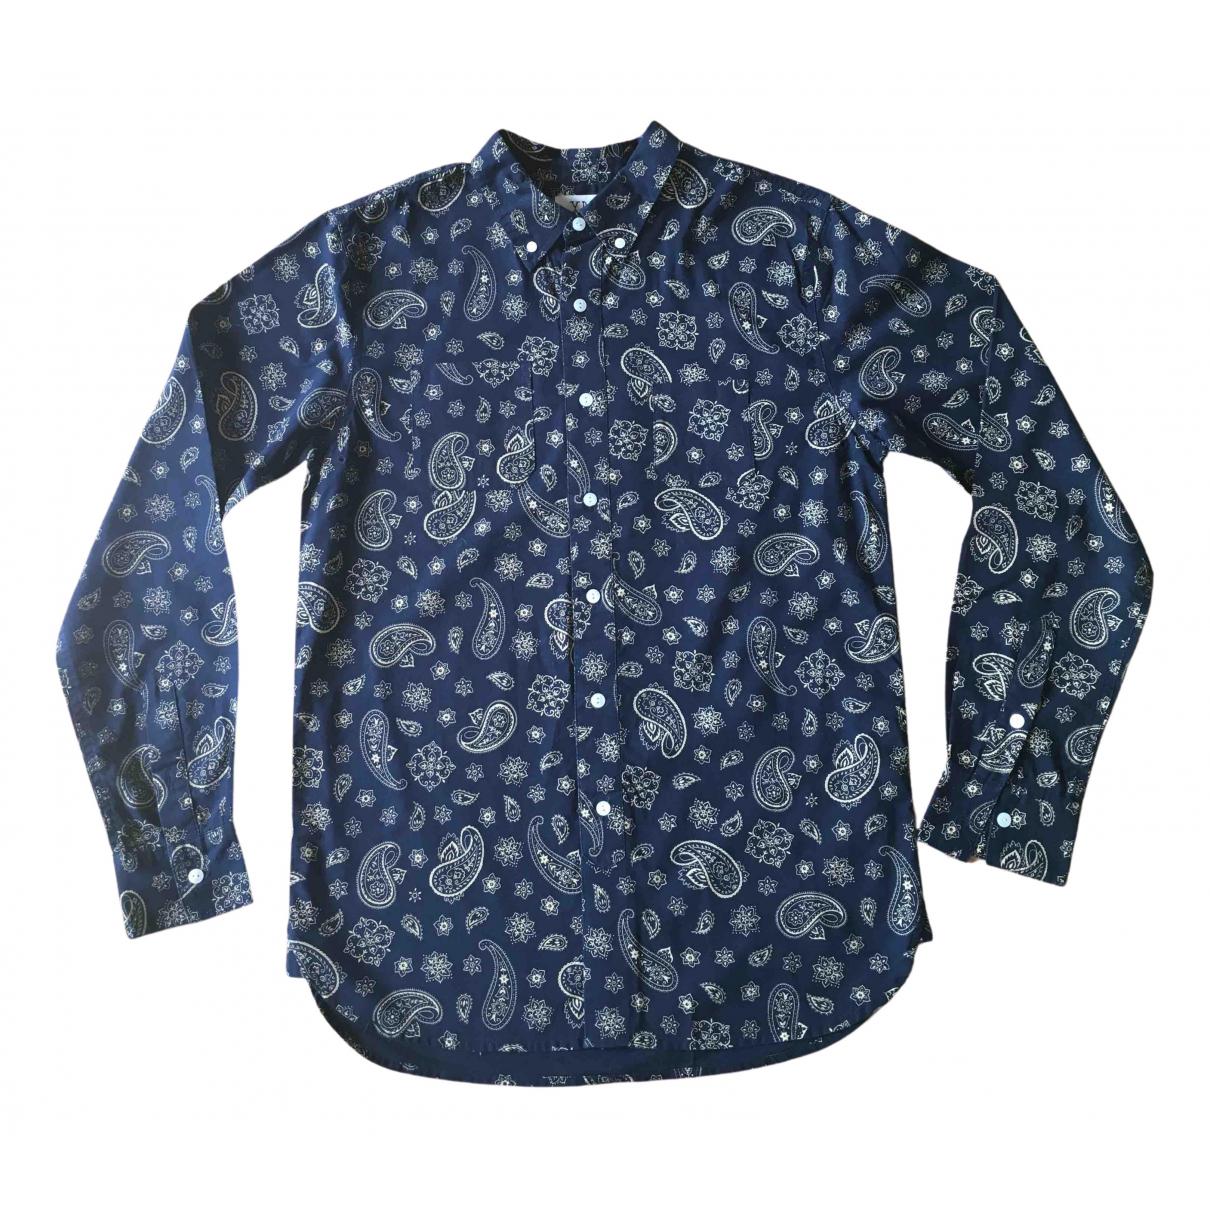 Ymc N Blue Cotton Shirts for Men S International